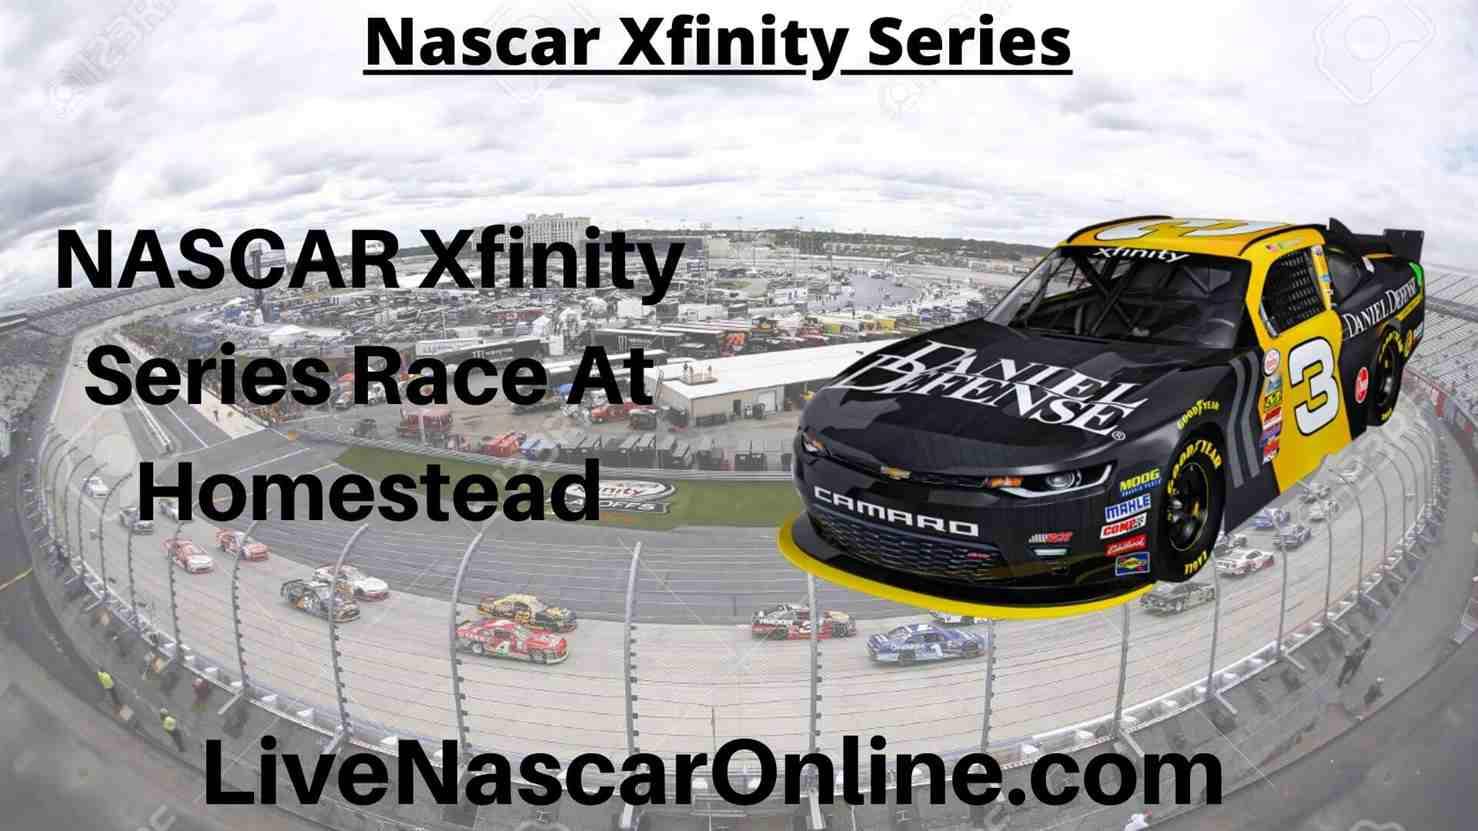 NASCAR Xfinity Series Online Stream | NASCAR Homestead 2020